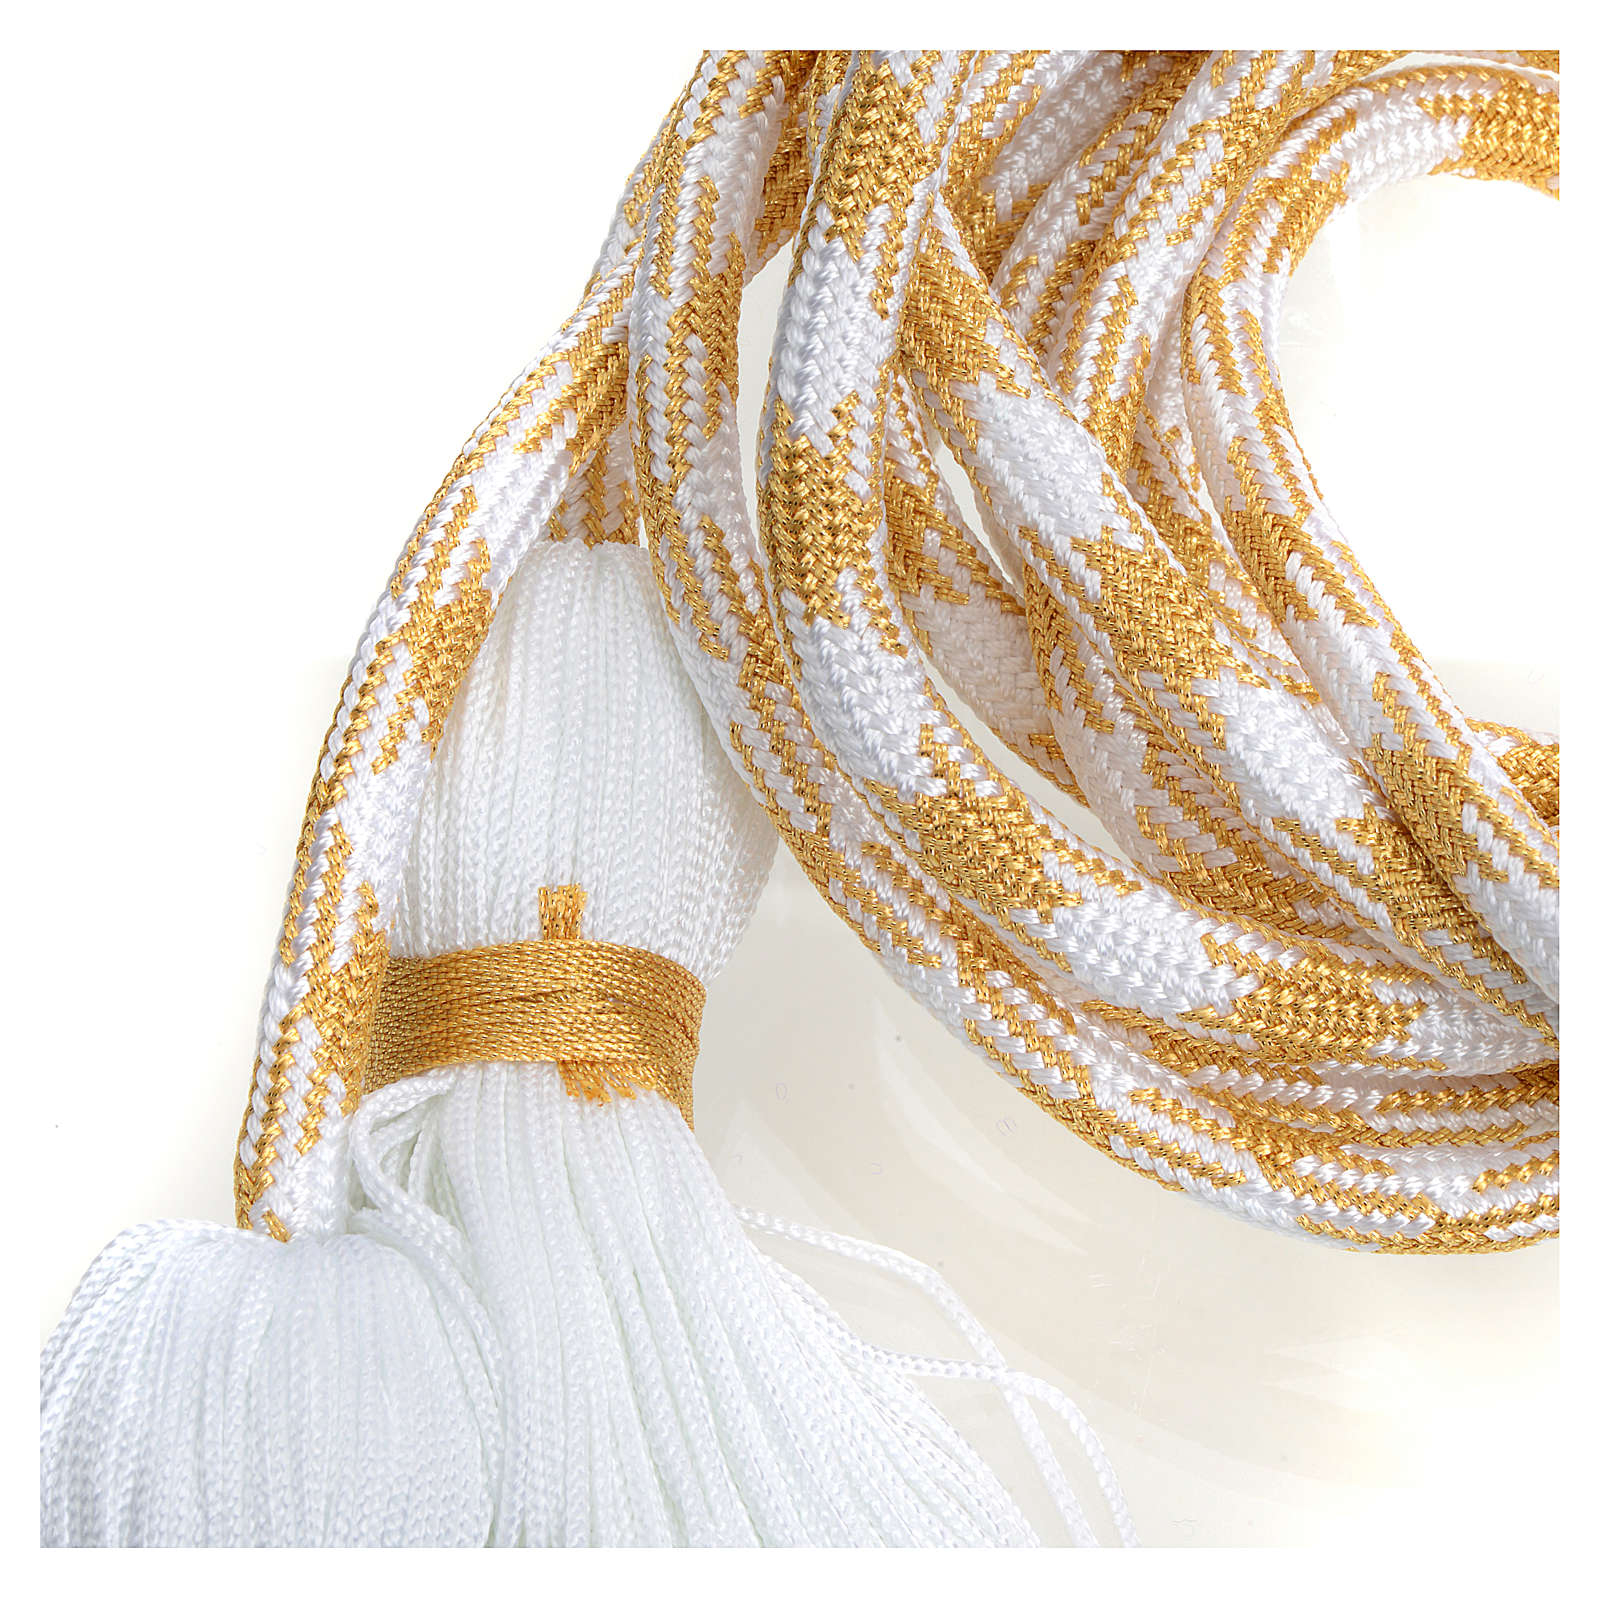 Golden cincture for alb 4